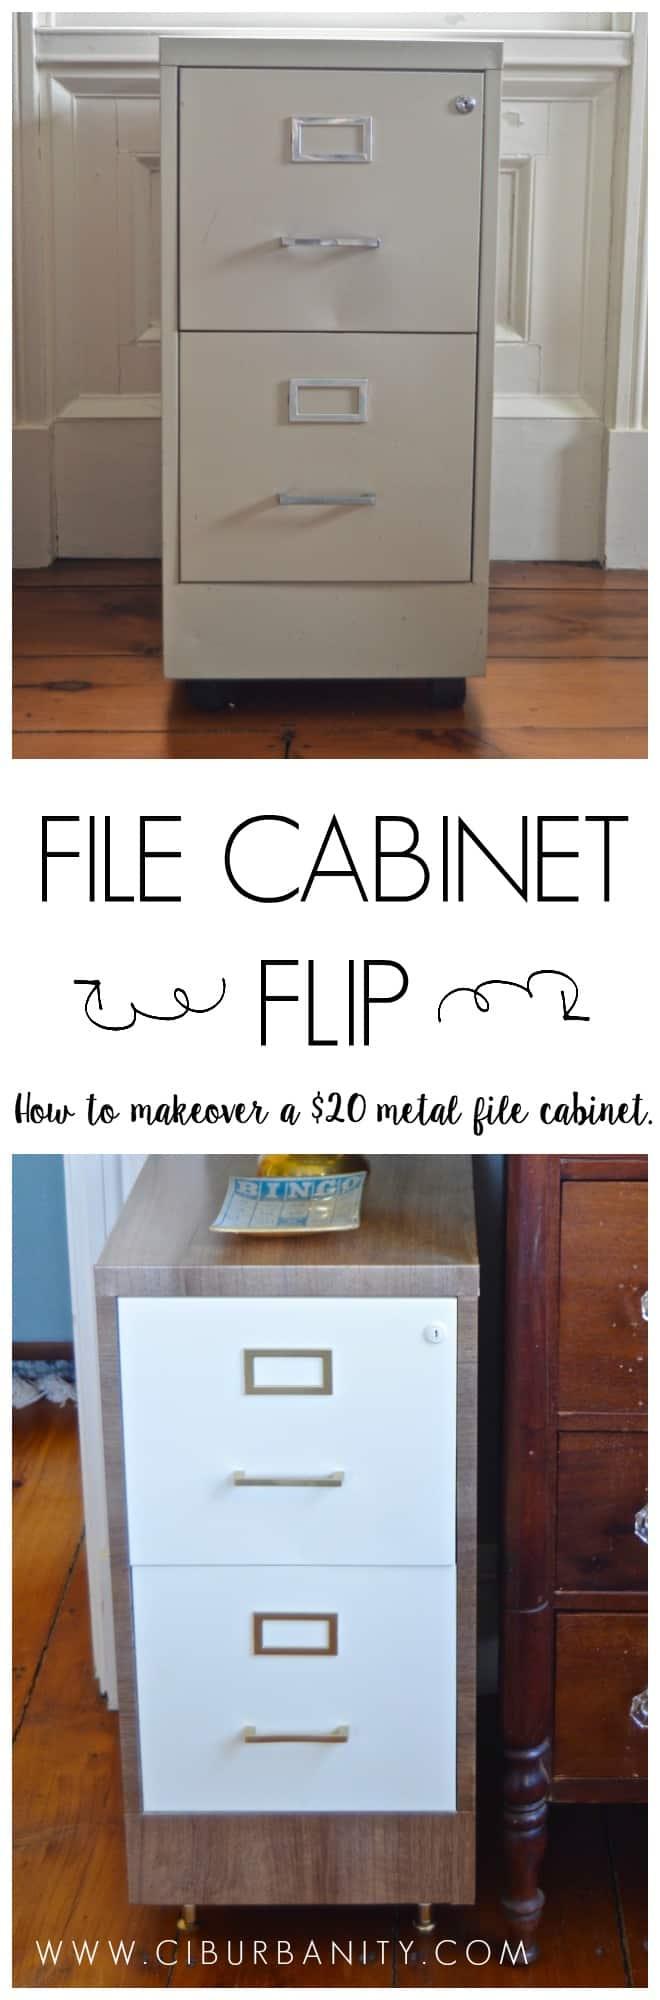 File Cabinet Flip